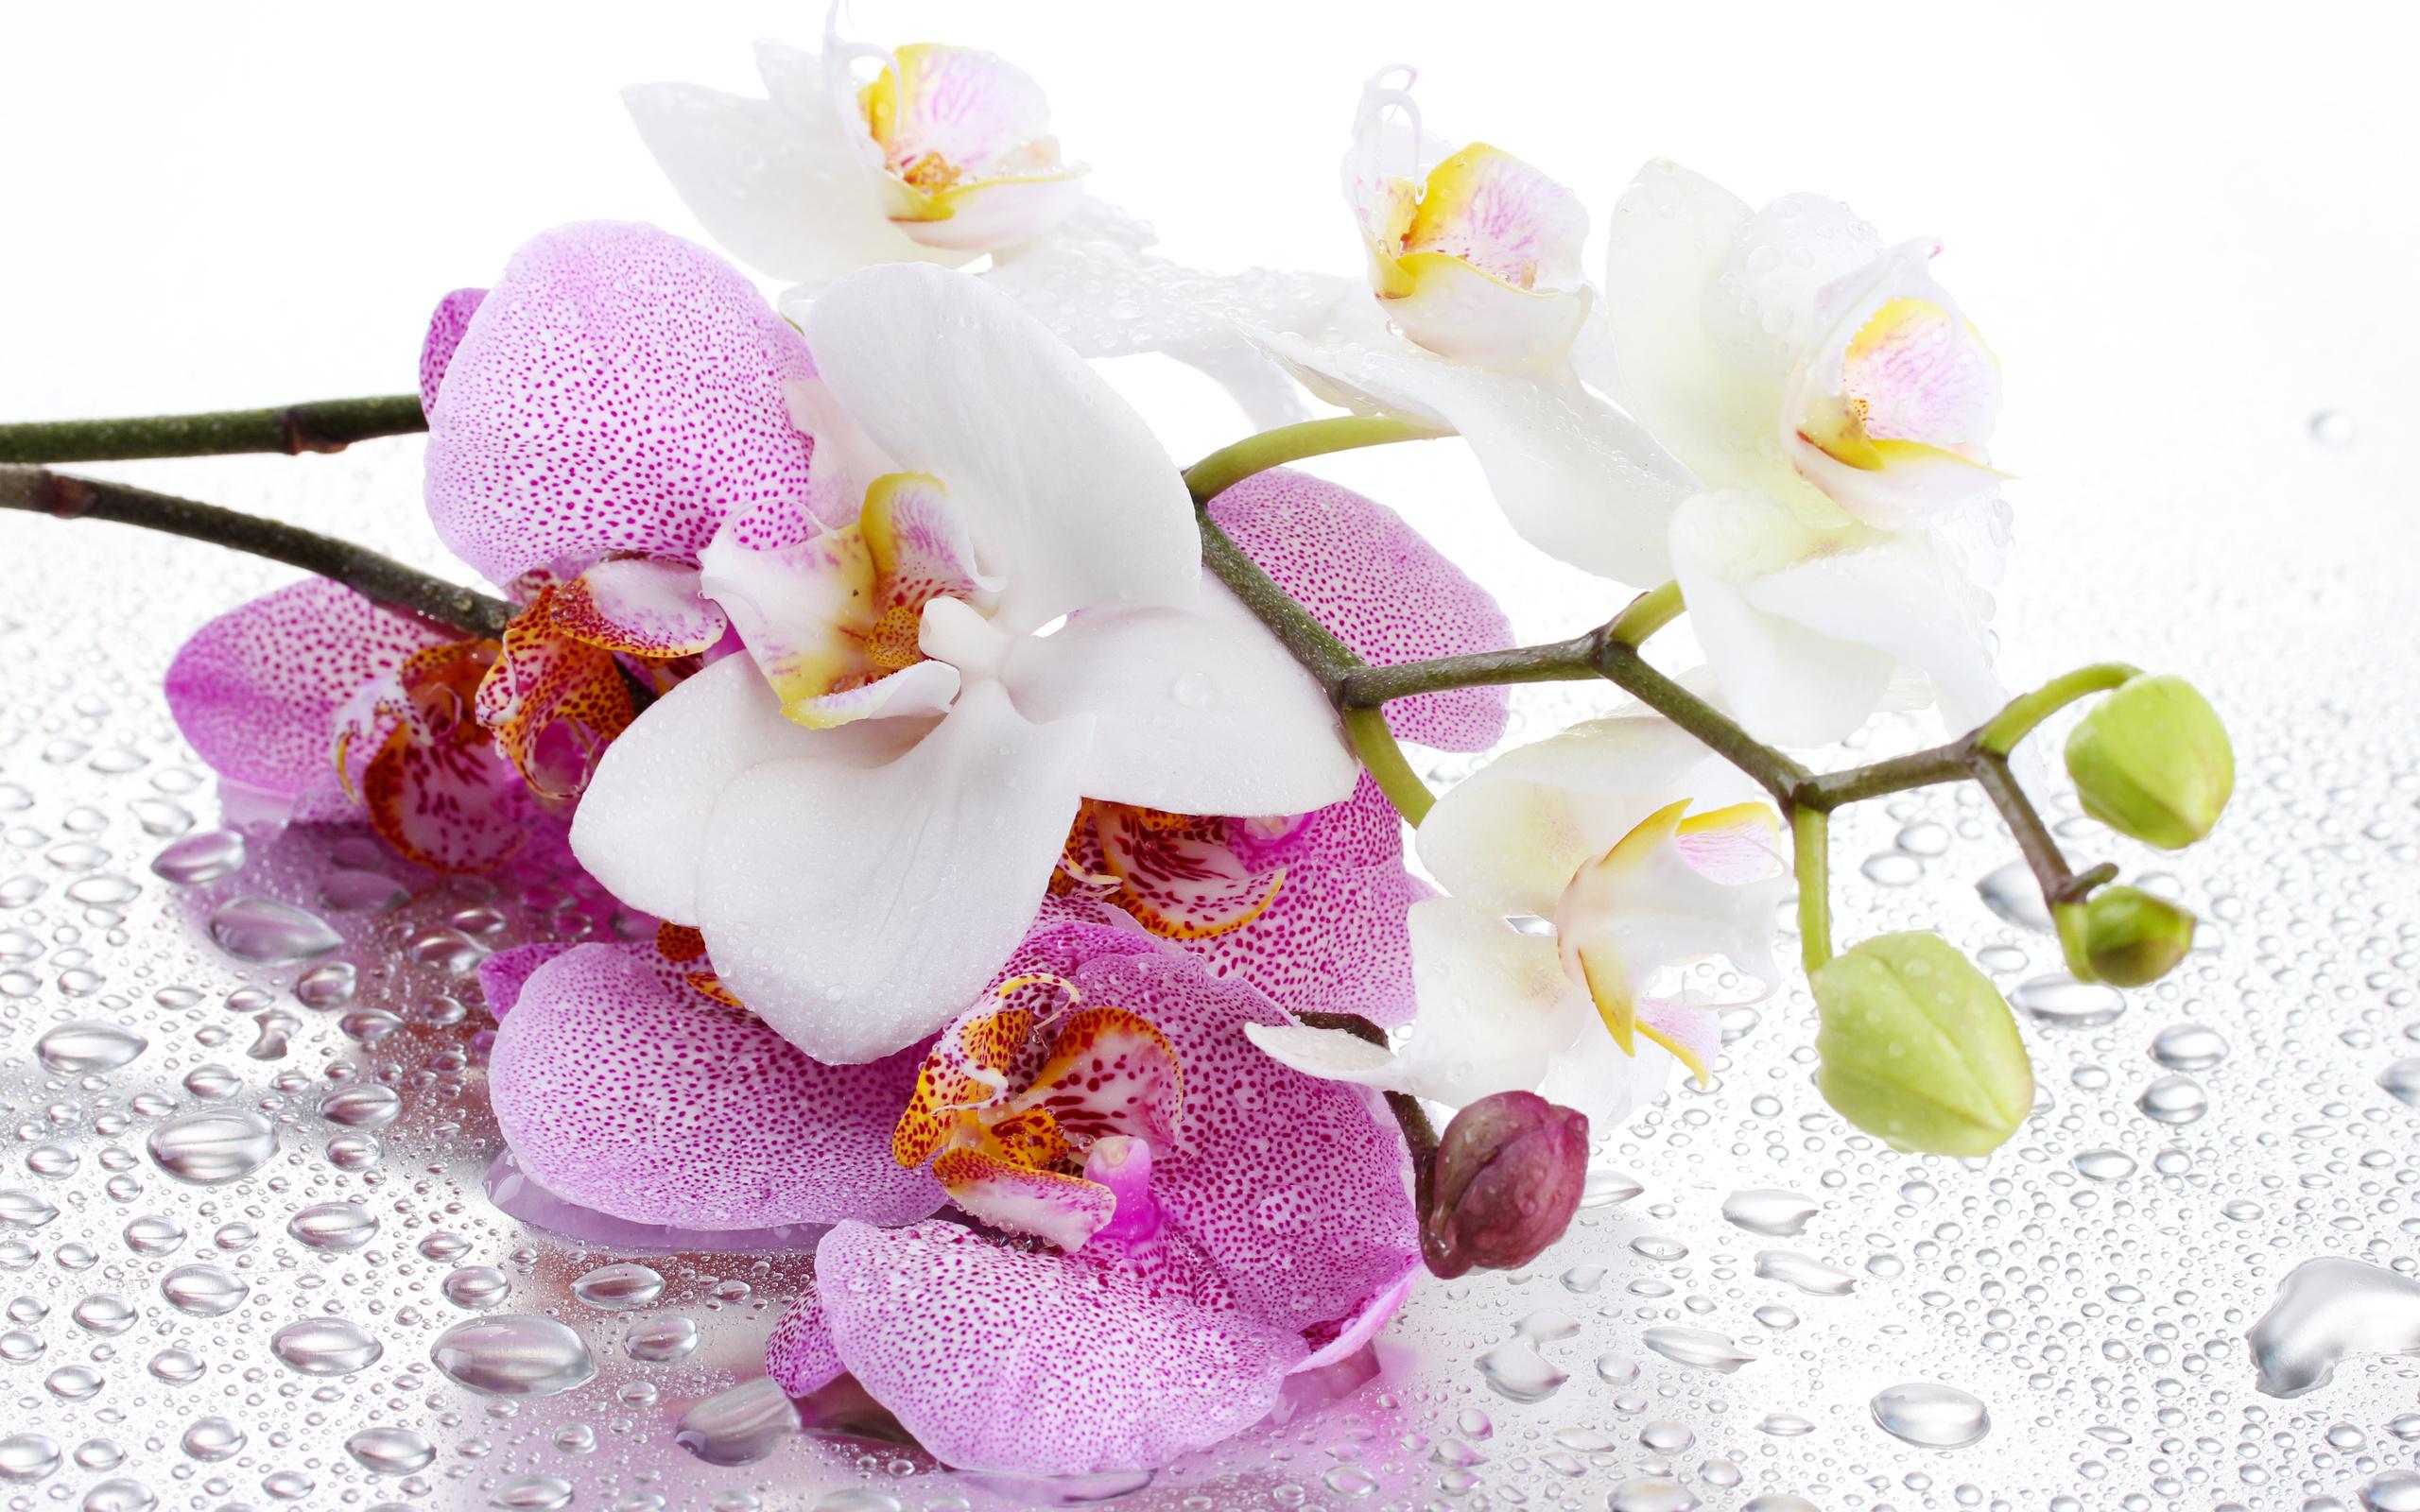 фото картинки орхидей натуре